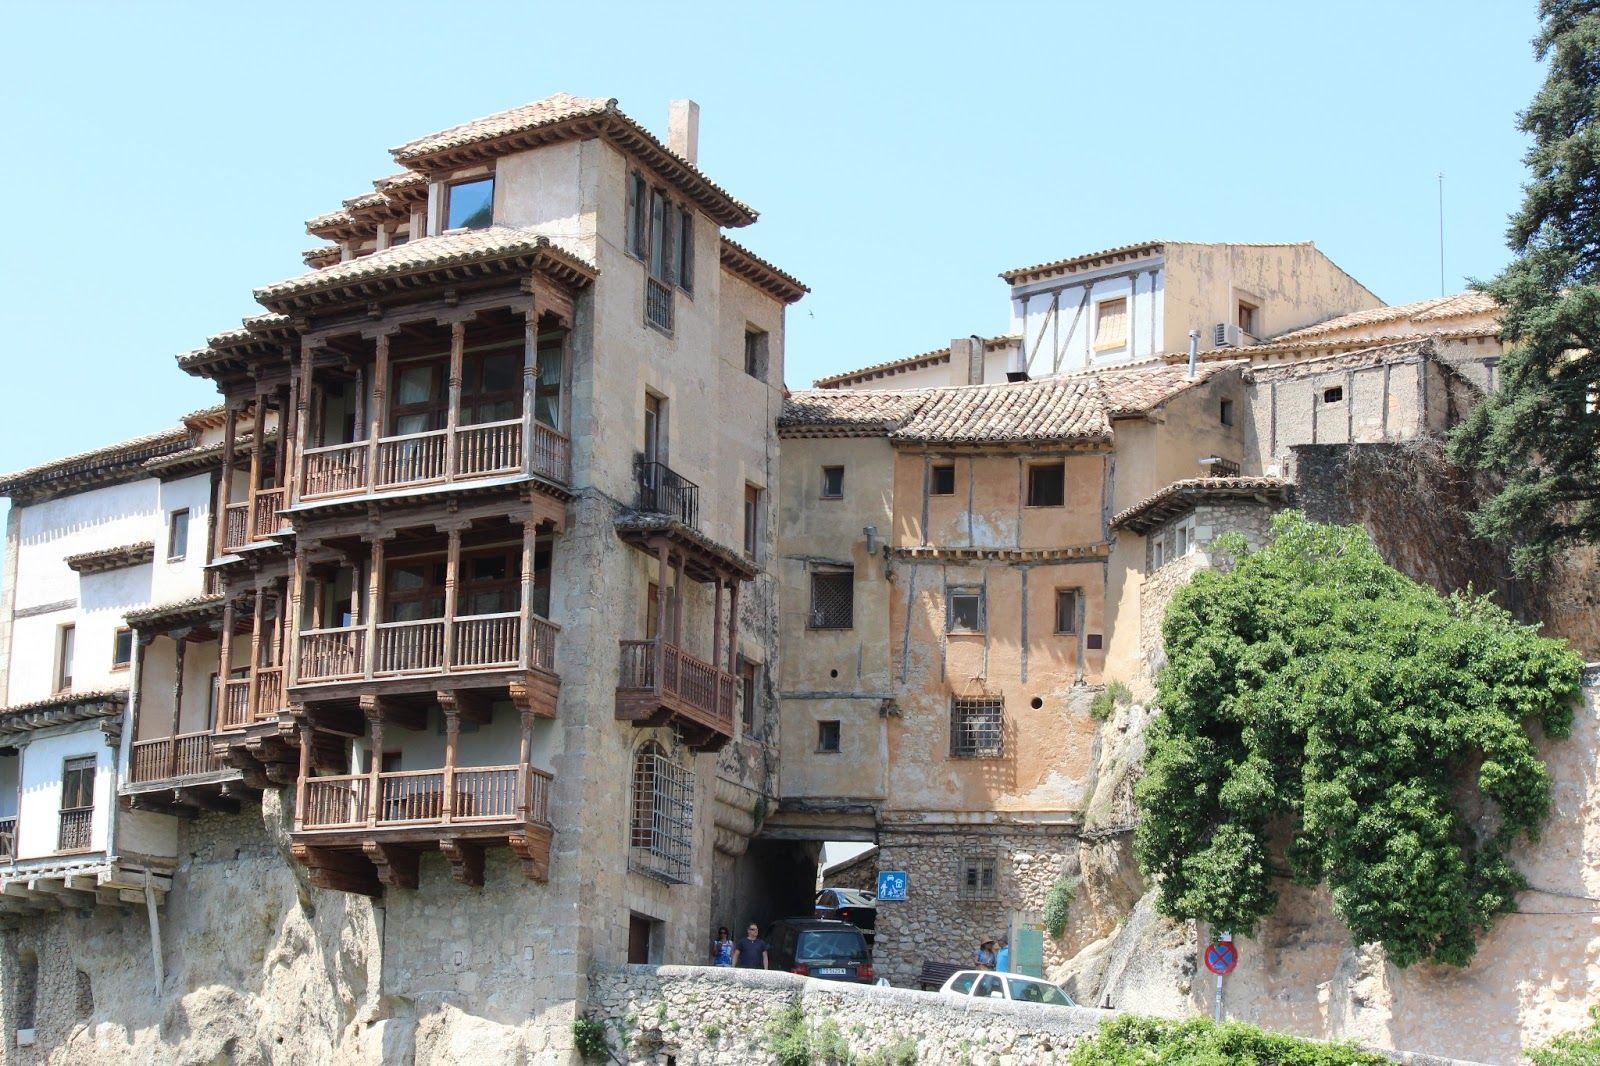 casas colgadas Cuenca Spain Andalusia spain, Andalusia